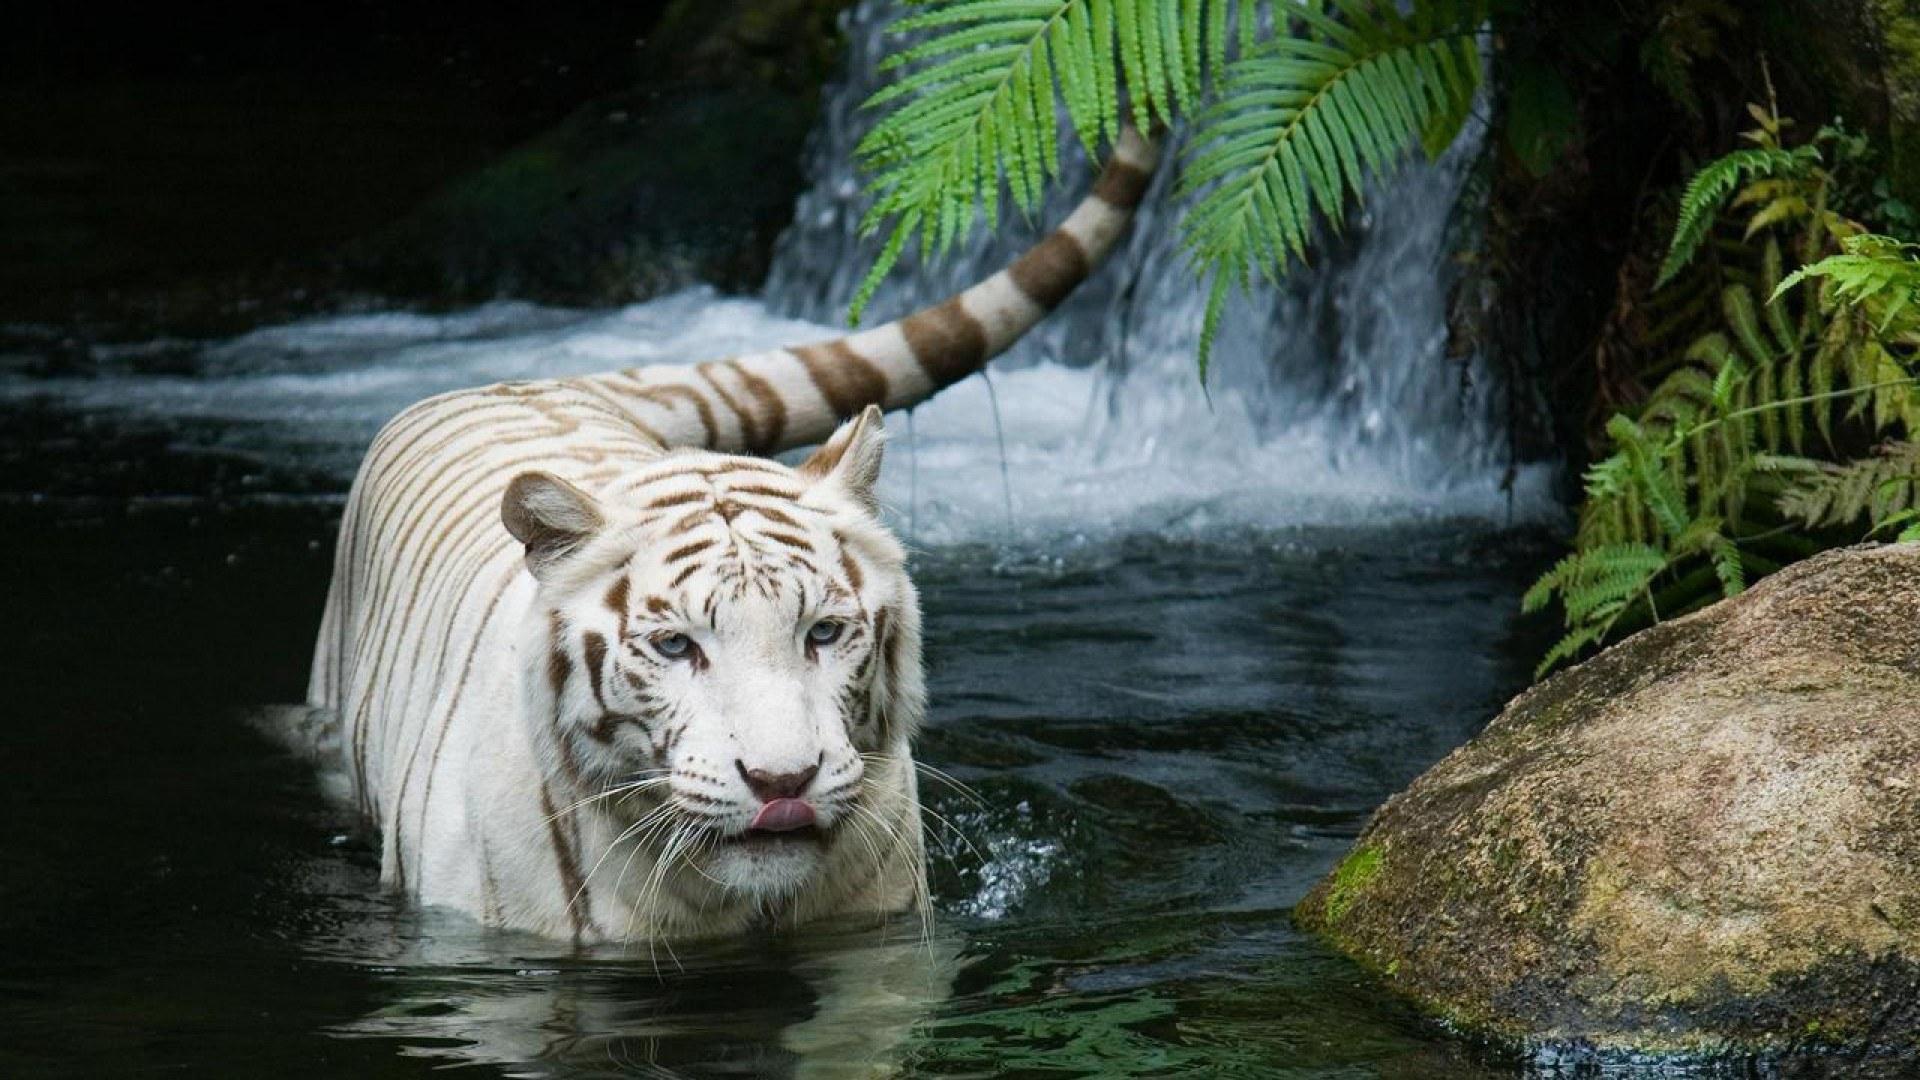 White Tiger Wallpaper HD 1920x1080 Wallpaper 1080p Widescreen 1920x1080